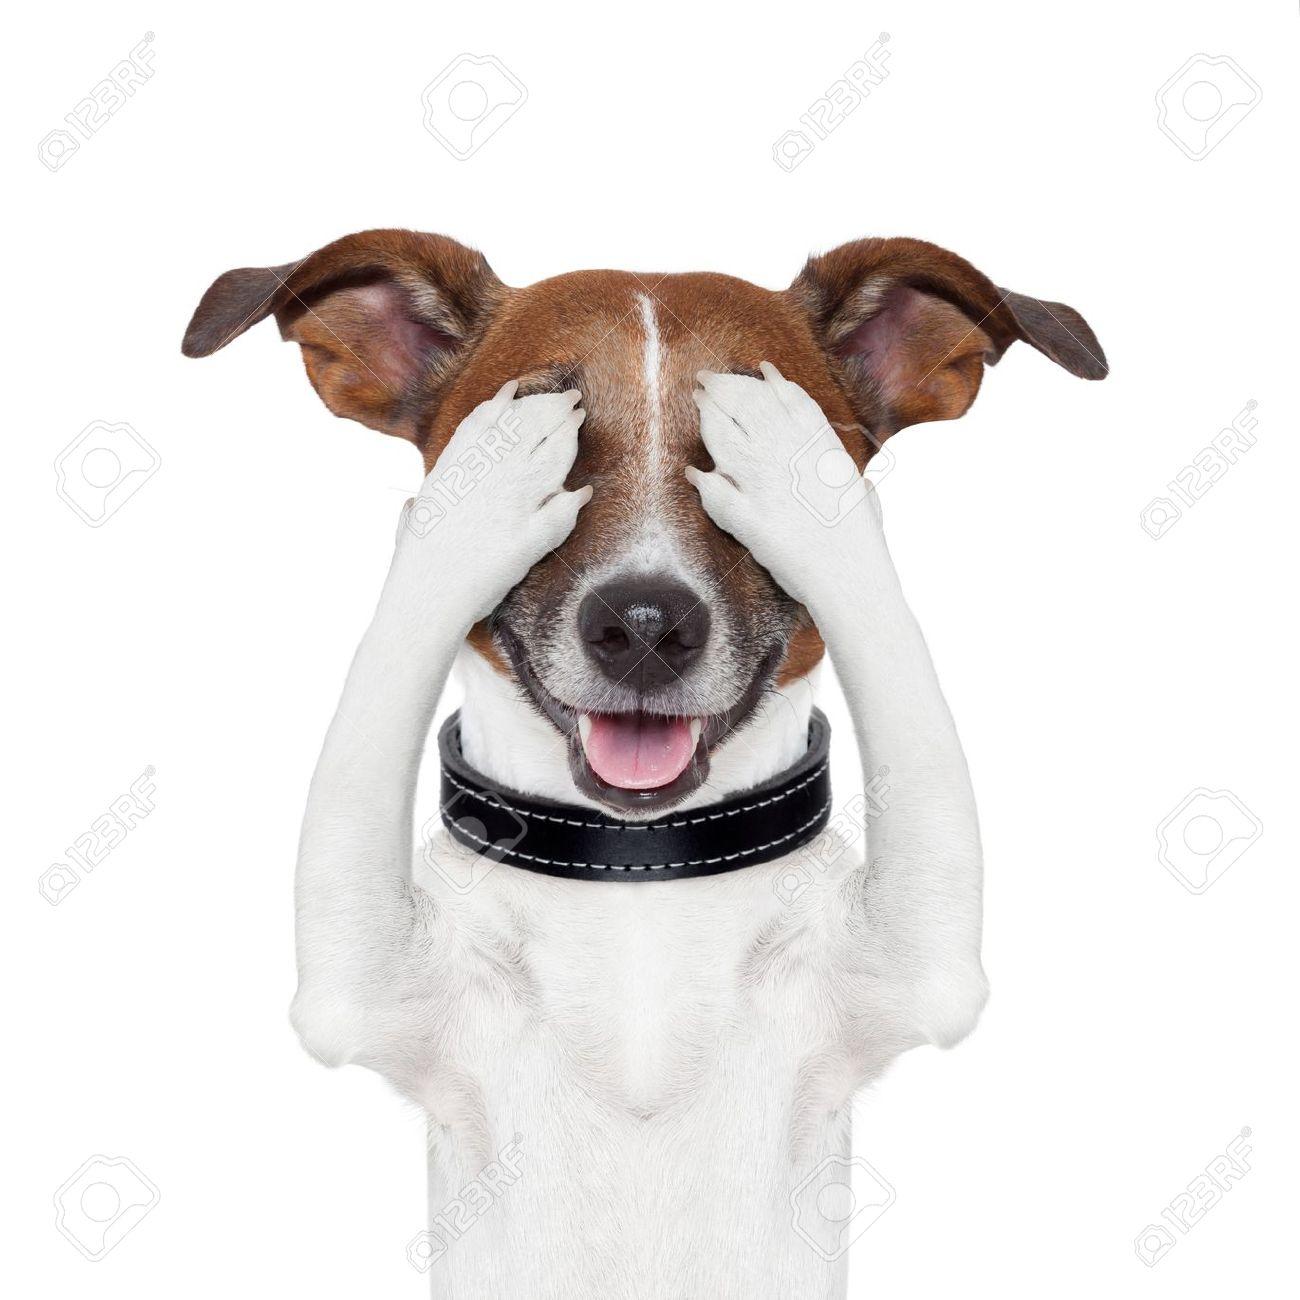 hiding covering both eyes dog Stock Photo - 15551833